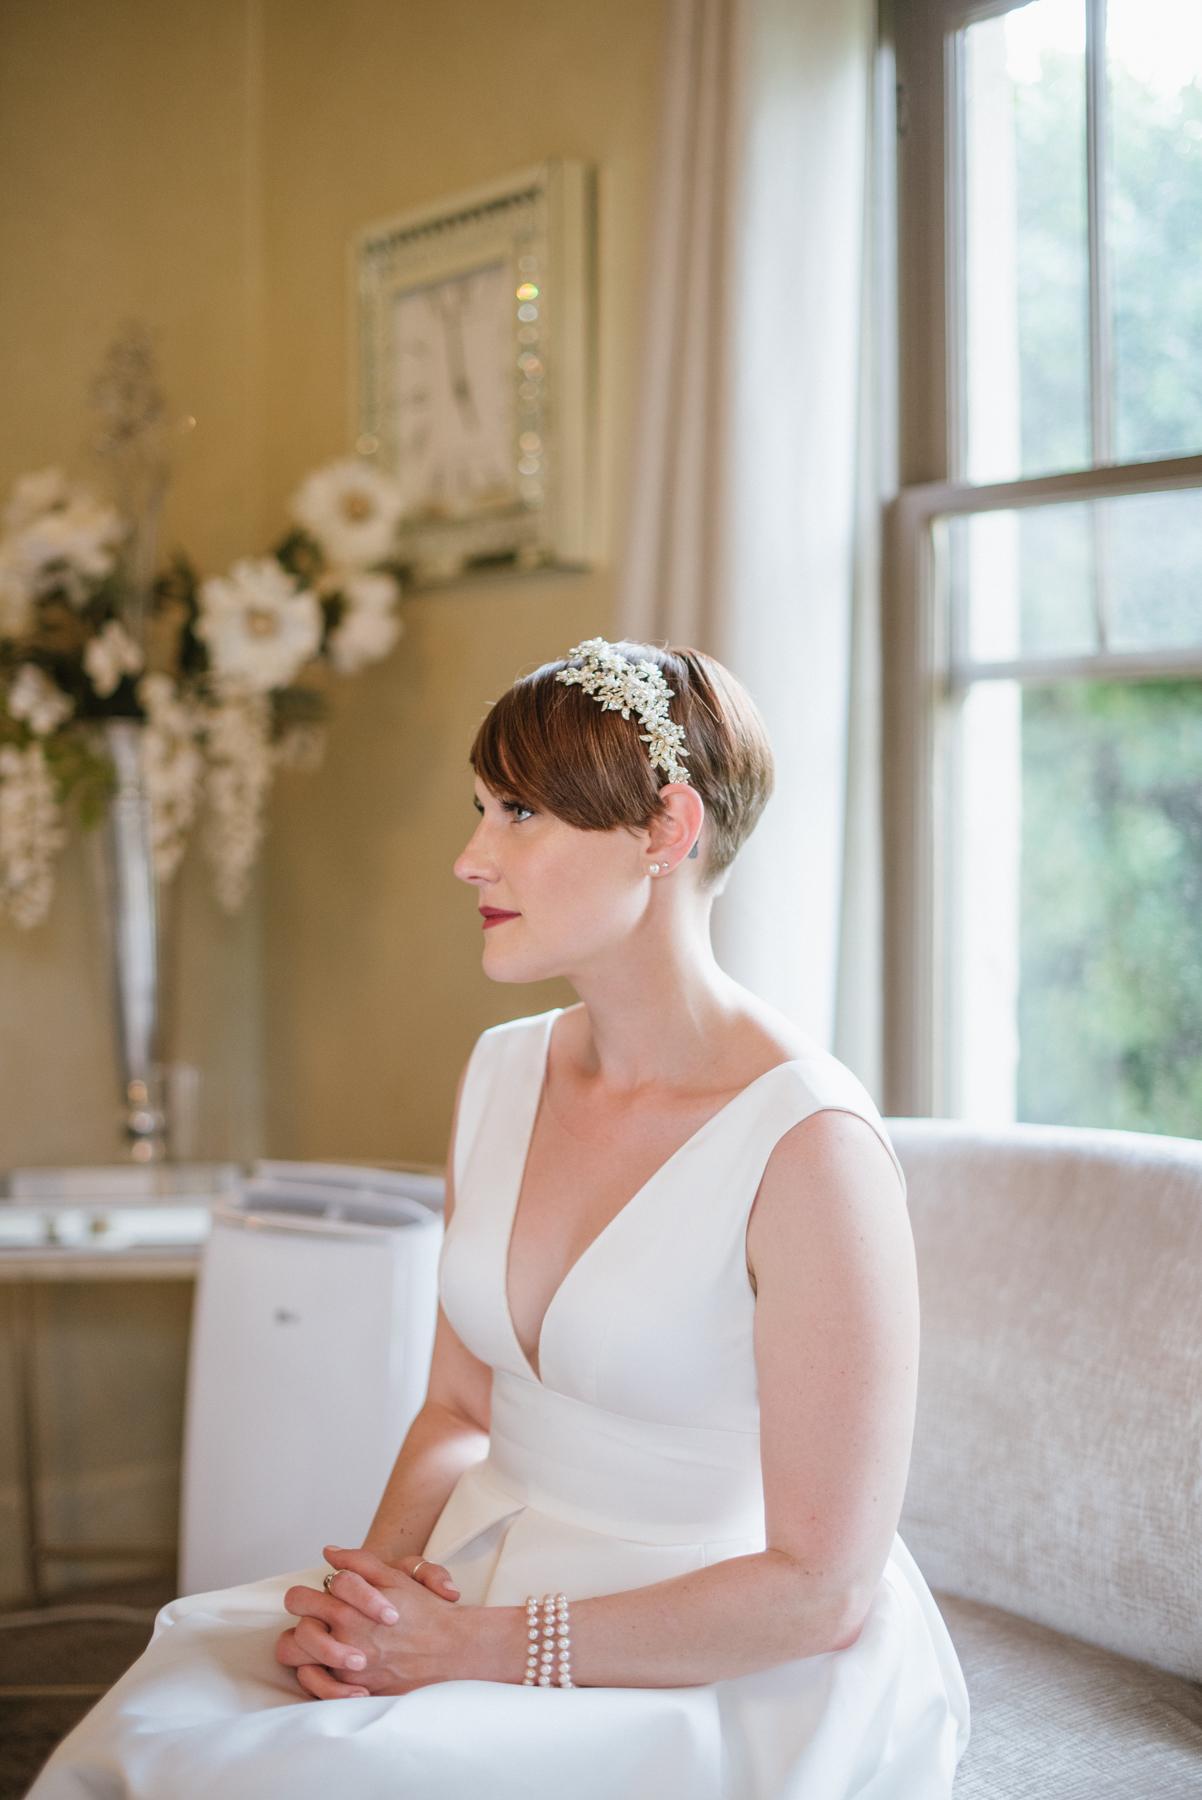 Secret Garden Event Center Wedding - Meredith Amadee Photography-12-2.jpg